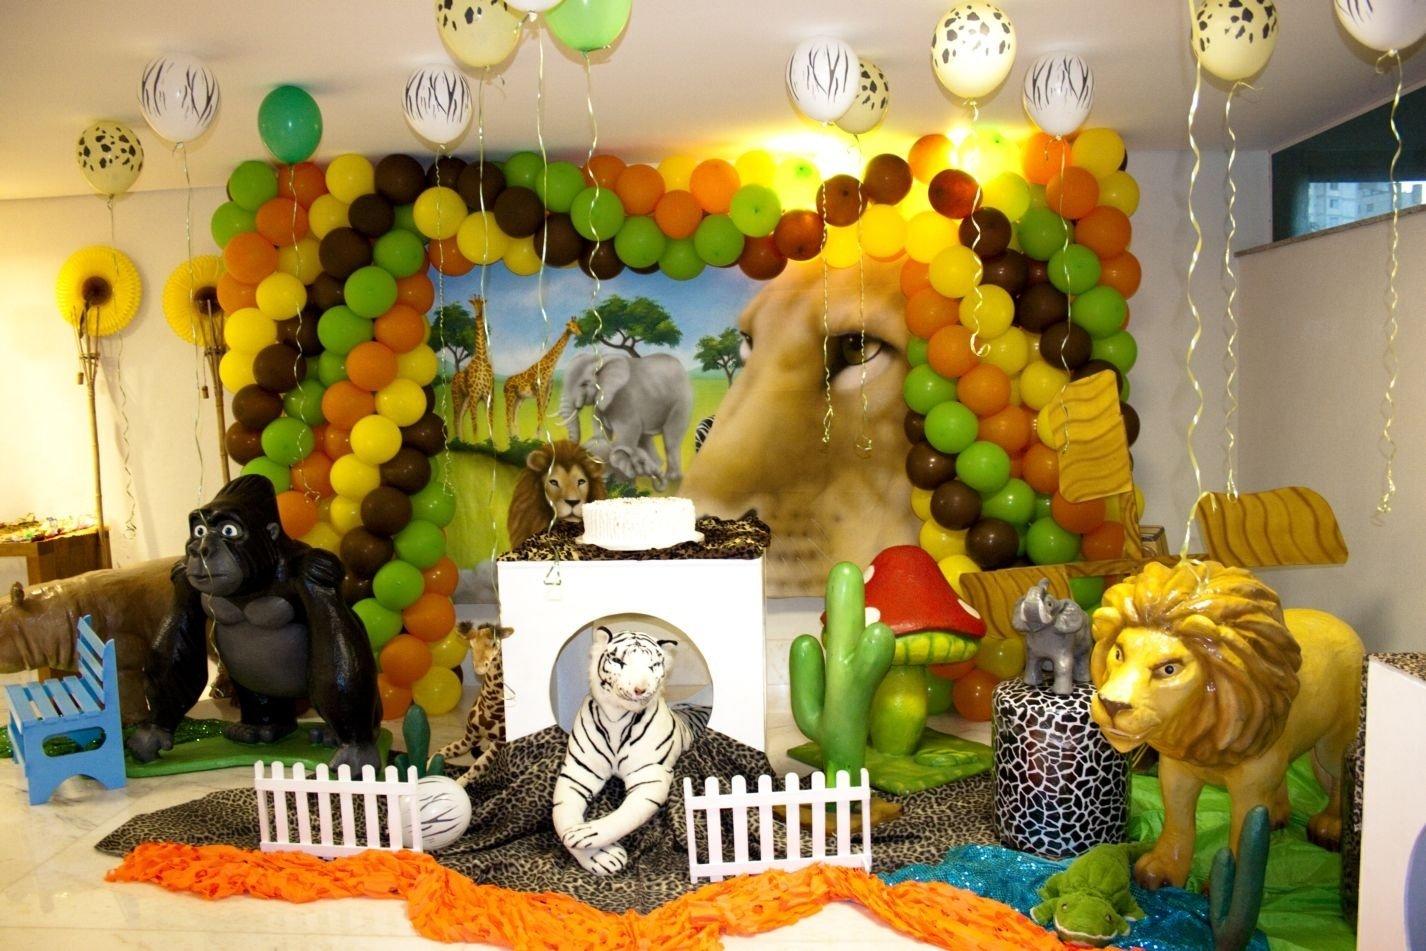 Imgenes De Ideas For A Safari Baby Shower